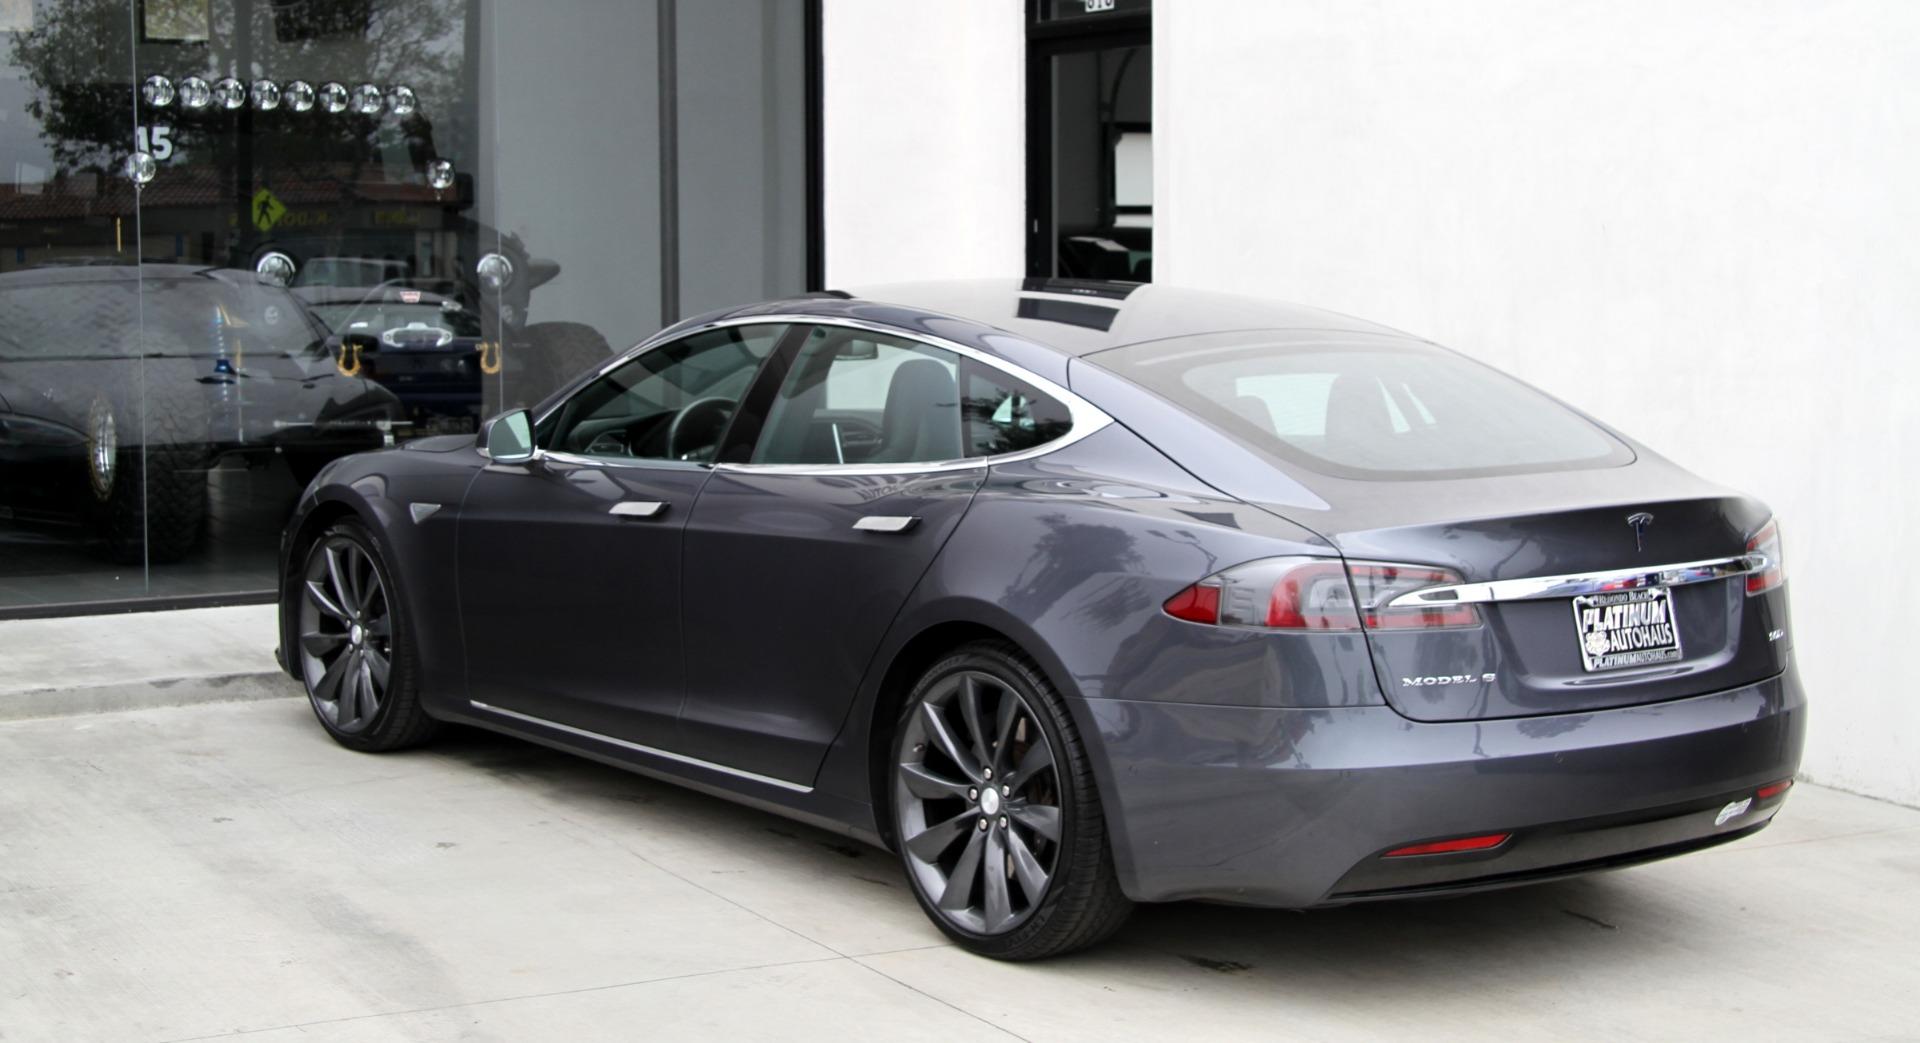 Used Wheels Near Me >> 2016 Tesla Model S 90D ** Autopilot ** Stock # 6173 for sale near Redondo Beach, CA | CA Tesla ...